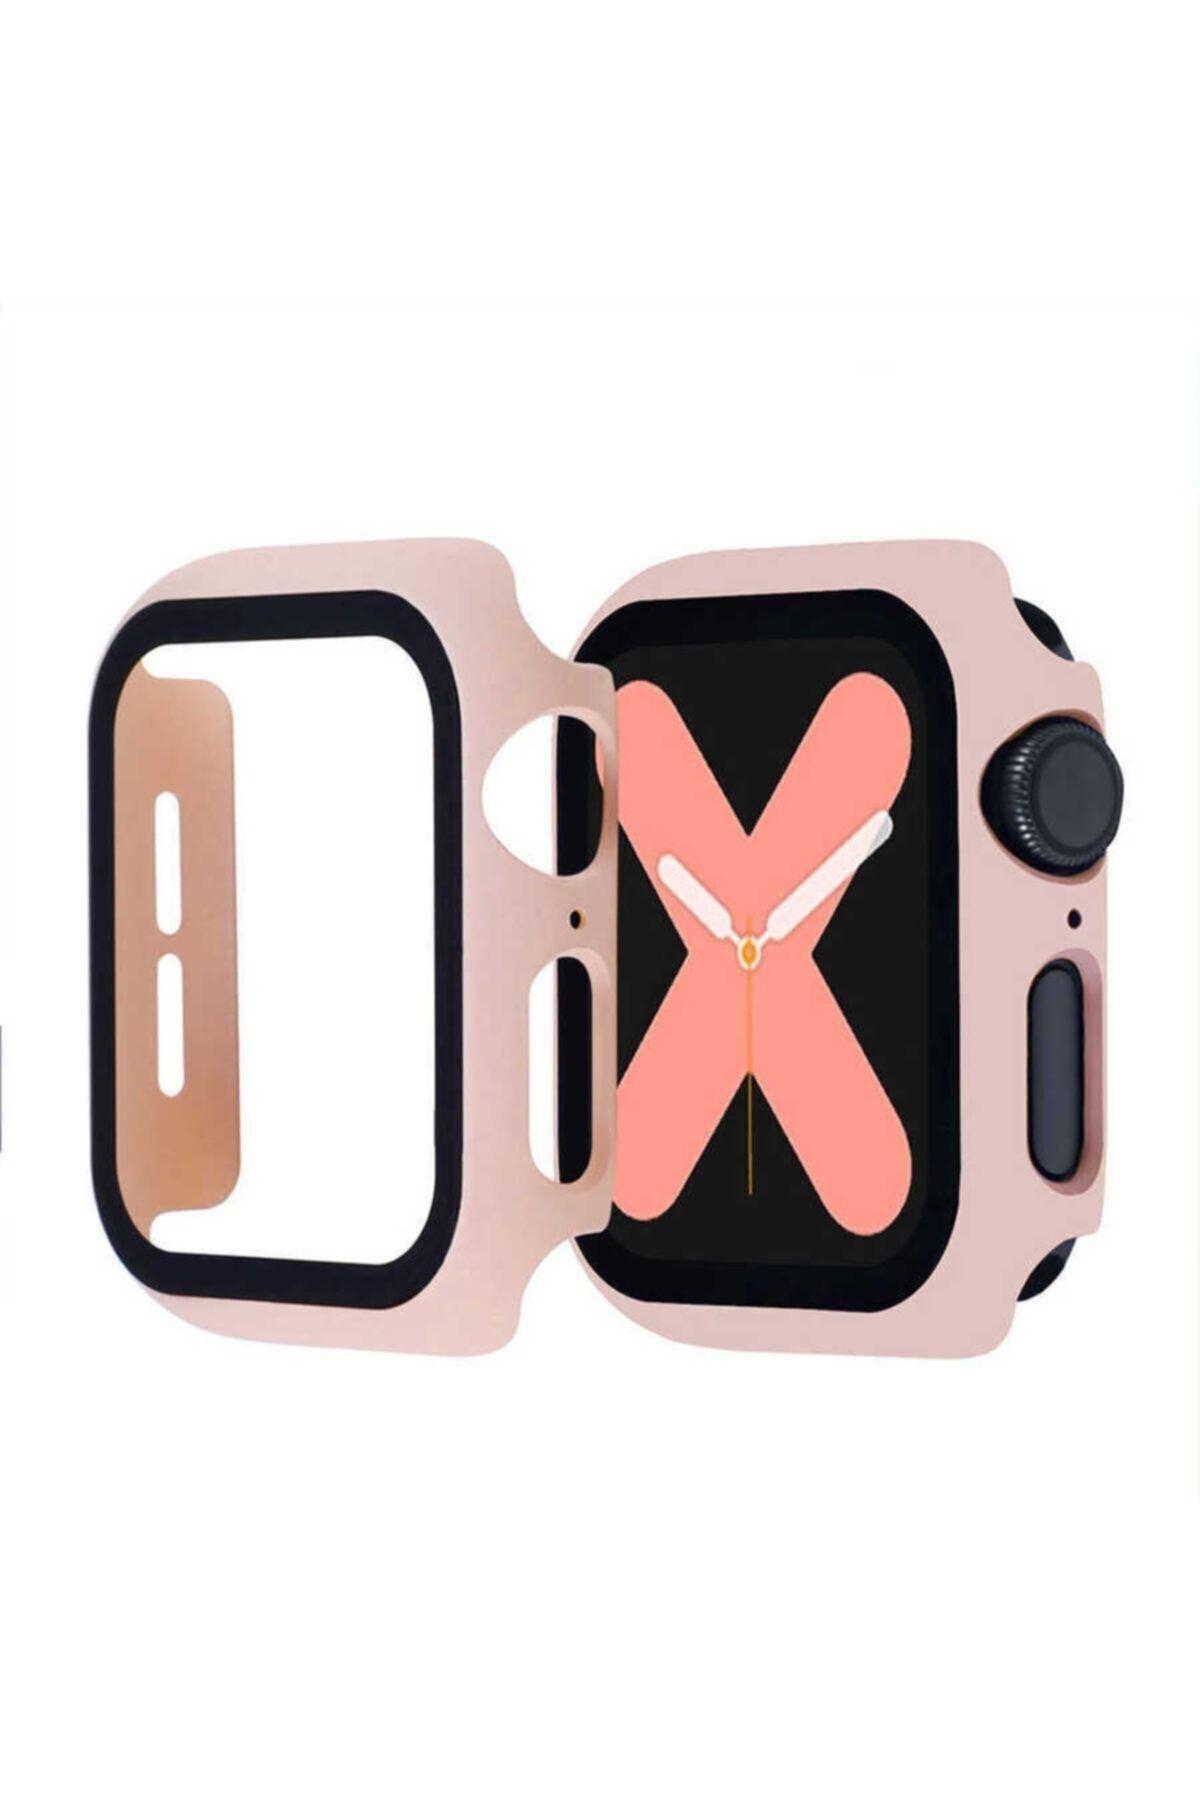 KVK PRİVACY Apple Watch Pembe Uyumlu Silikon Kılıf 42mm 1